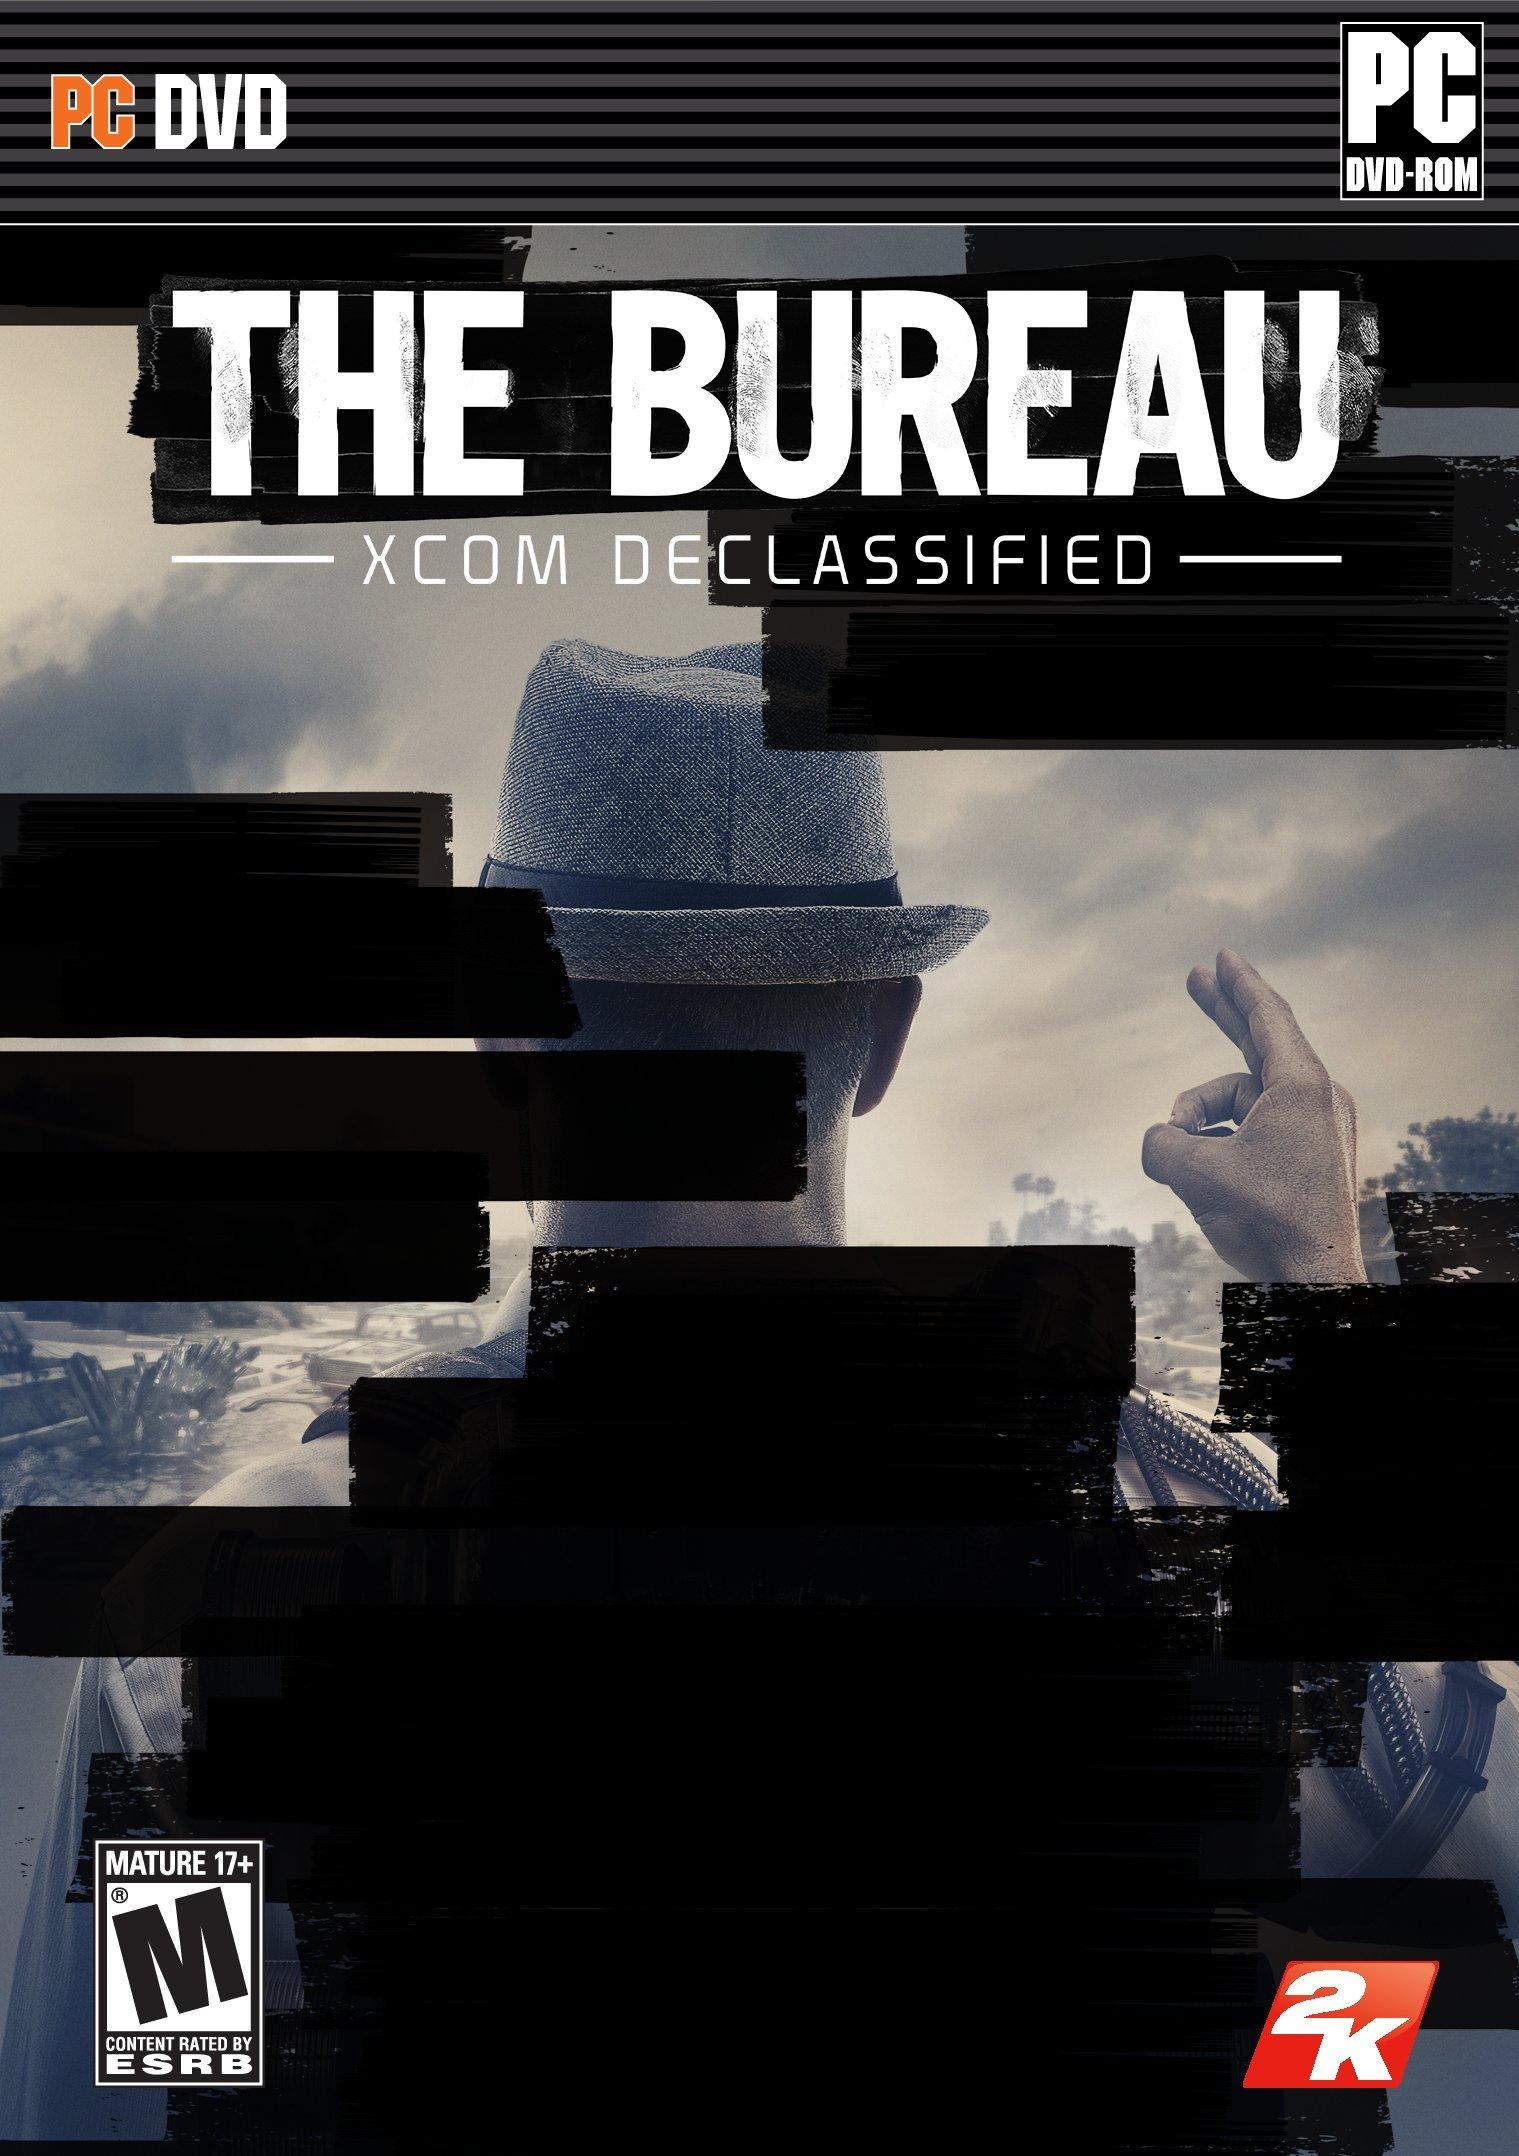 The Bureau XCOM Declassified Release Date Xbox 360 PS3 PC